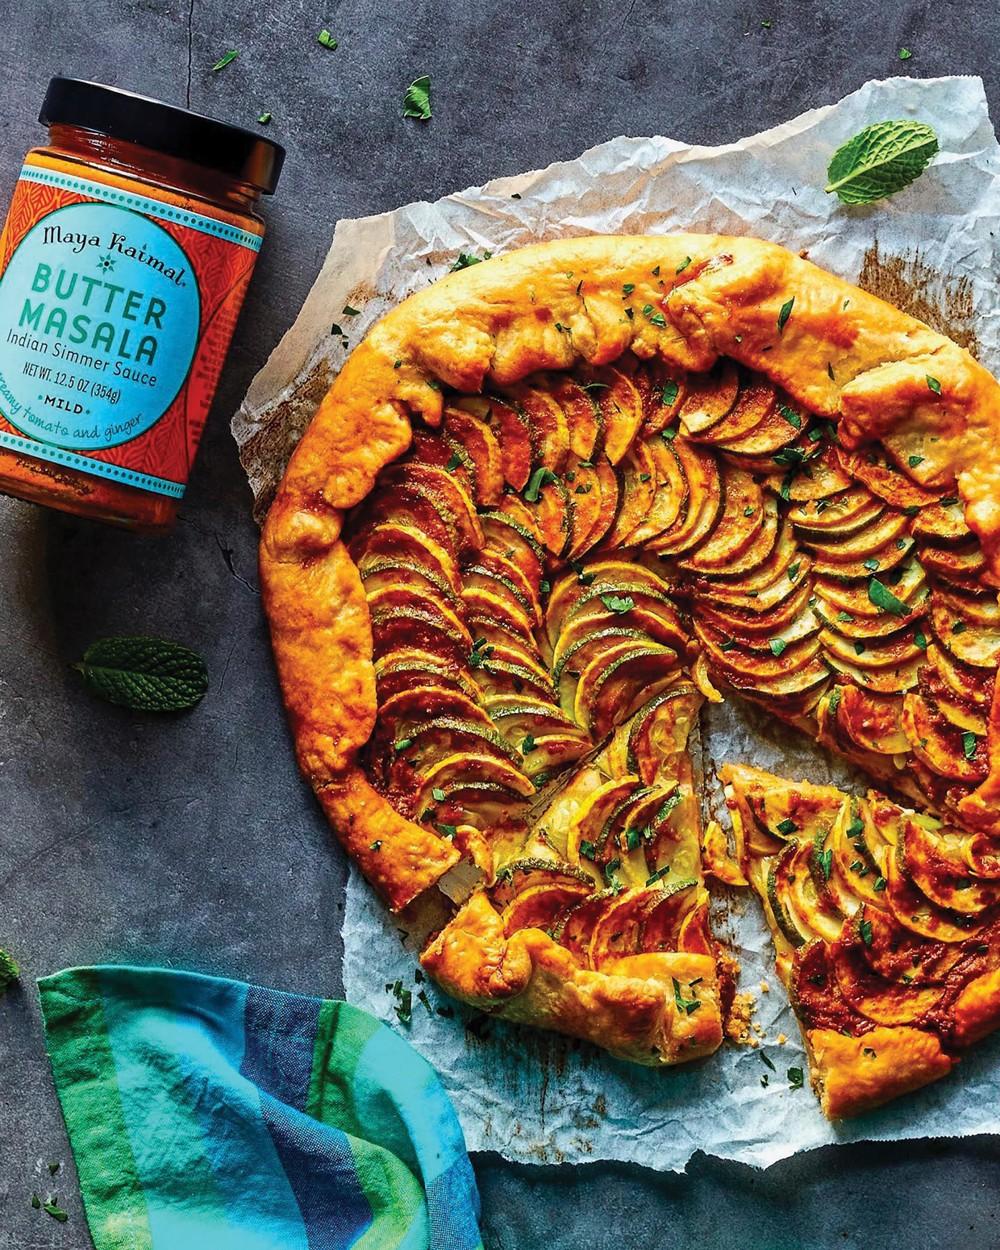 Masala Squash Galette: Flaky pastry topped with seasonal squash, fresh herbs, and Maya Kaimal's Butter Masala.